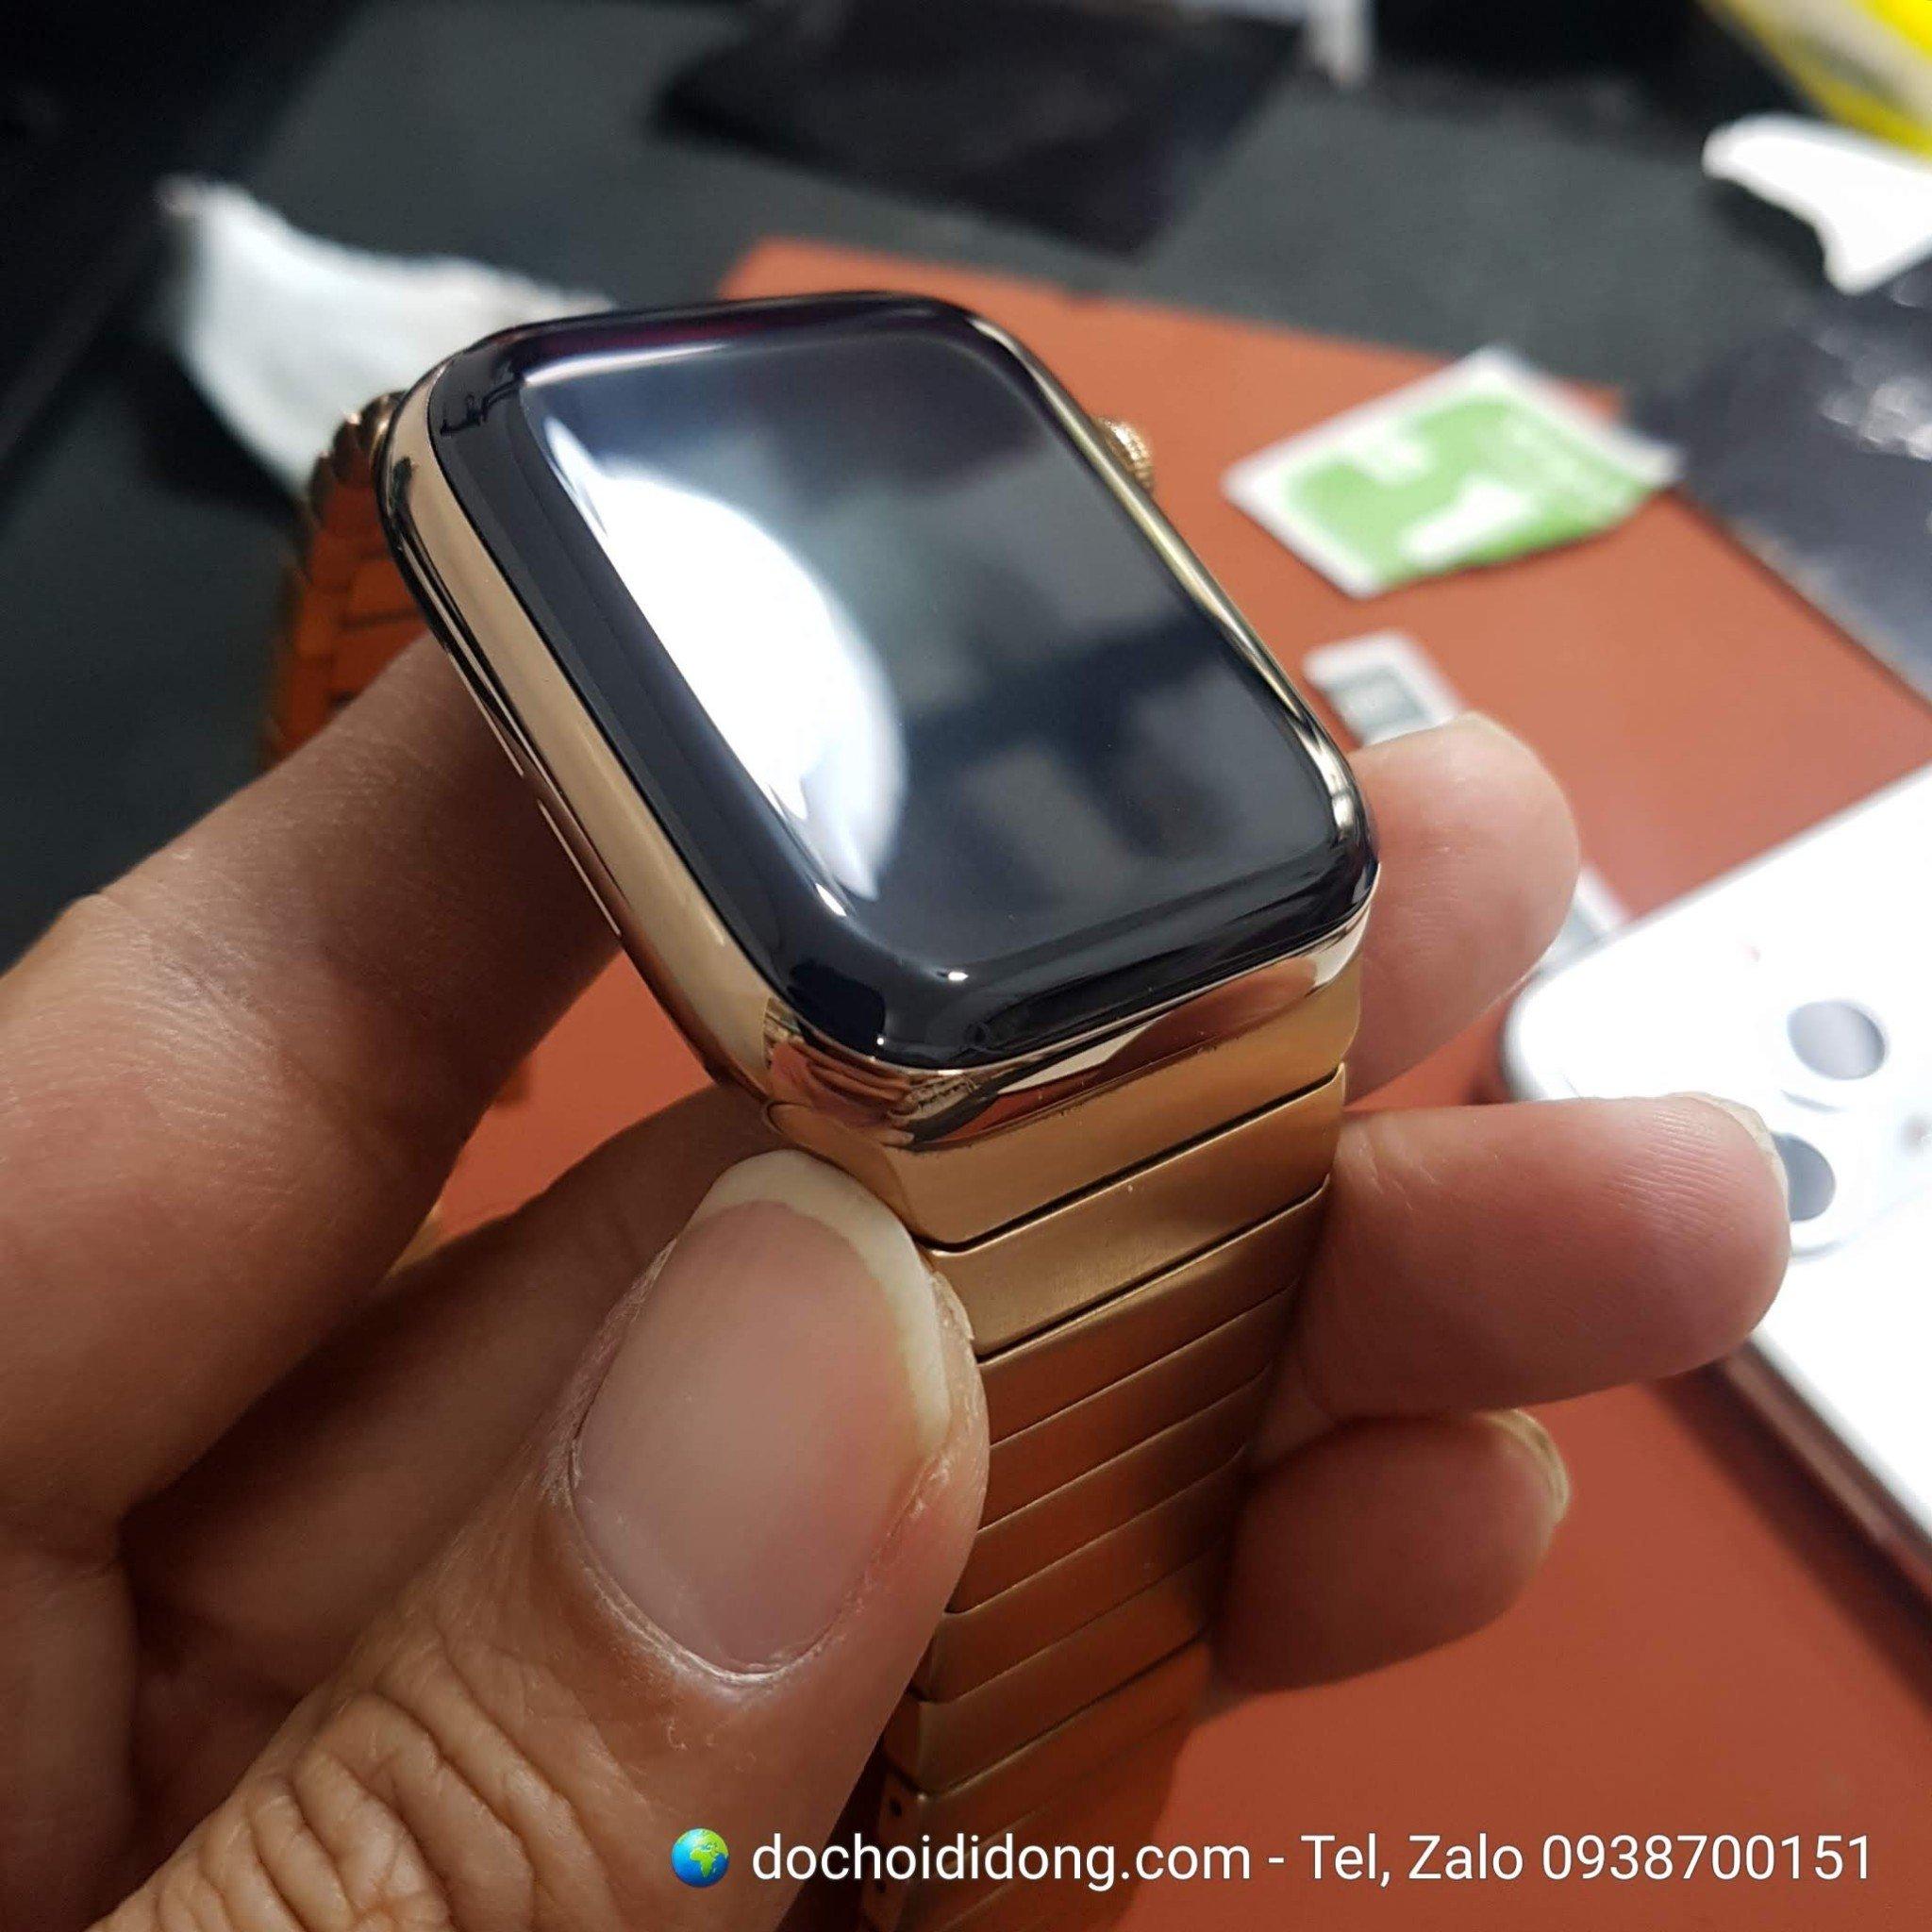 dan-cuong-luc-dong-ho-apple-watch-zacase-3d-polyme-sieu-ben